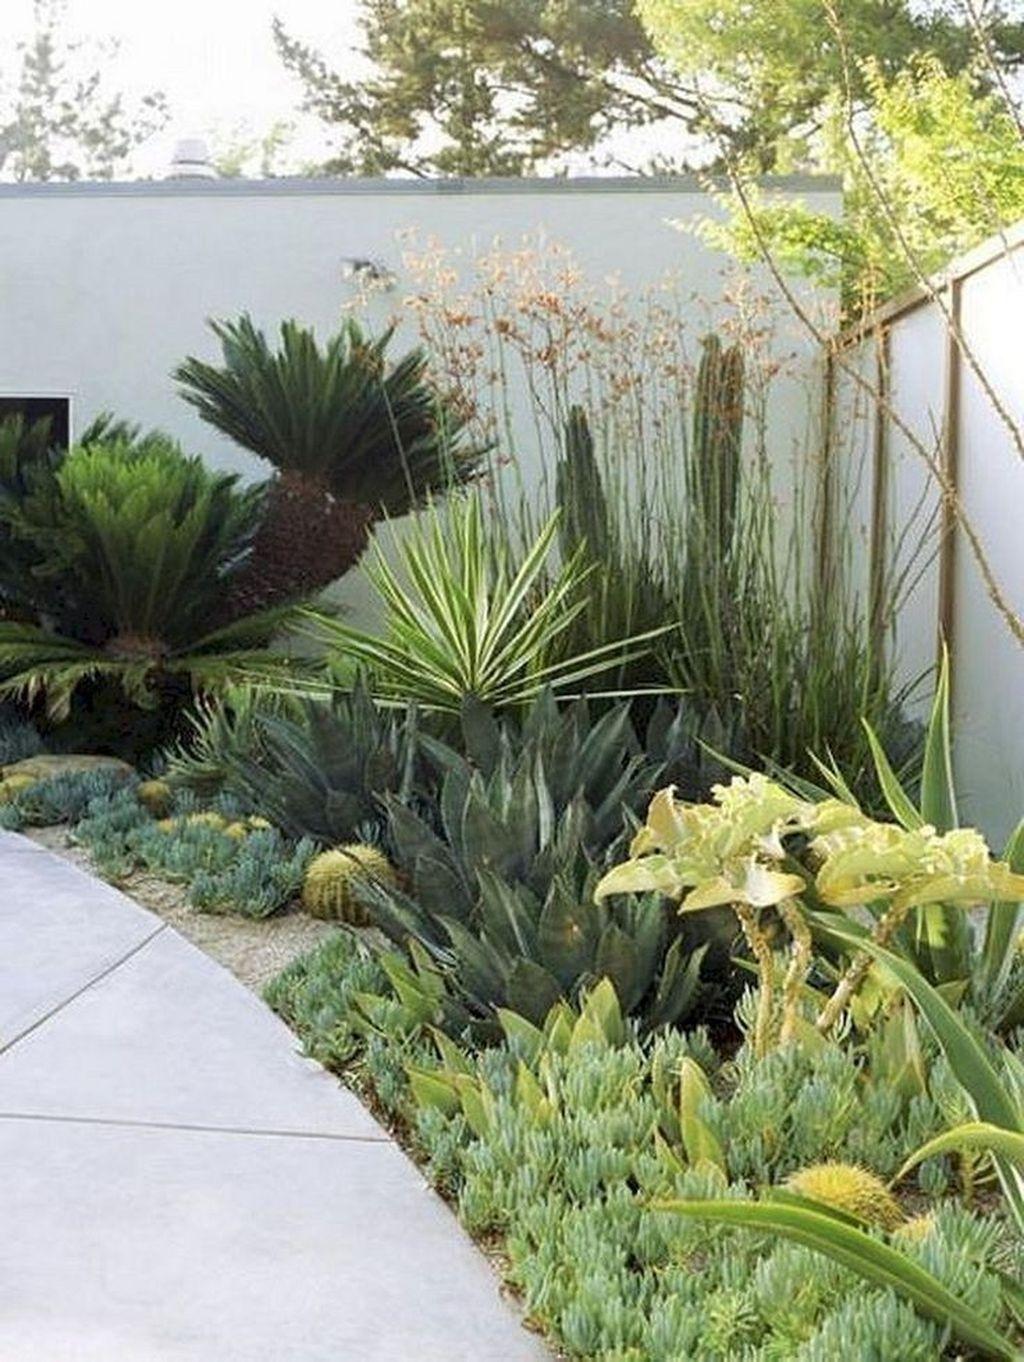 Incredible Cactus Garden Landscaping Ideas Best For Summer 03